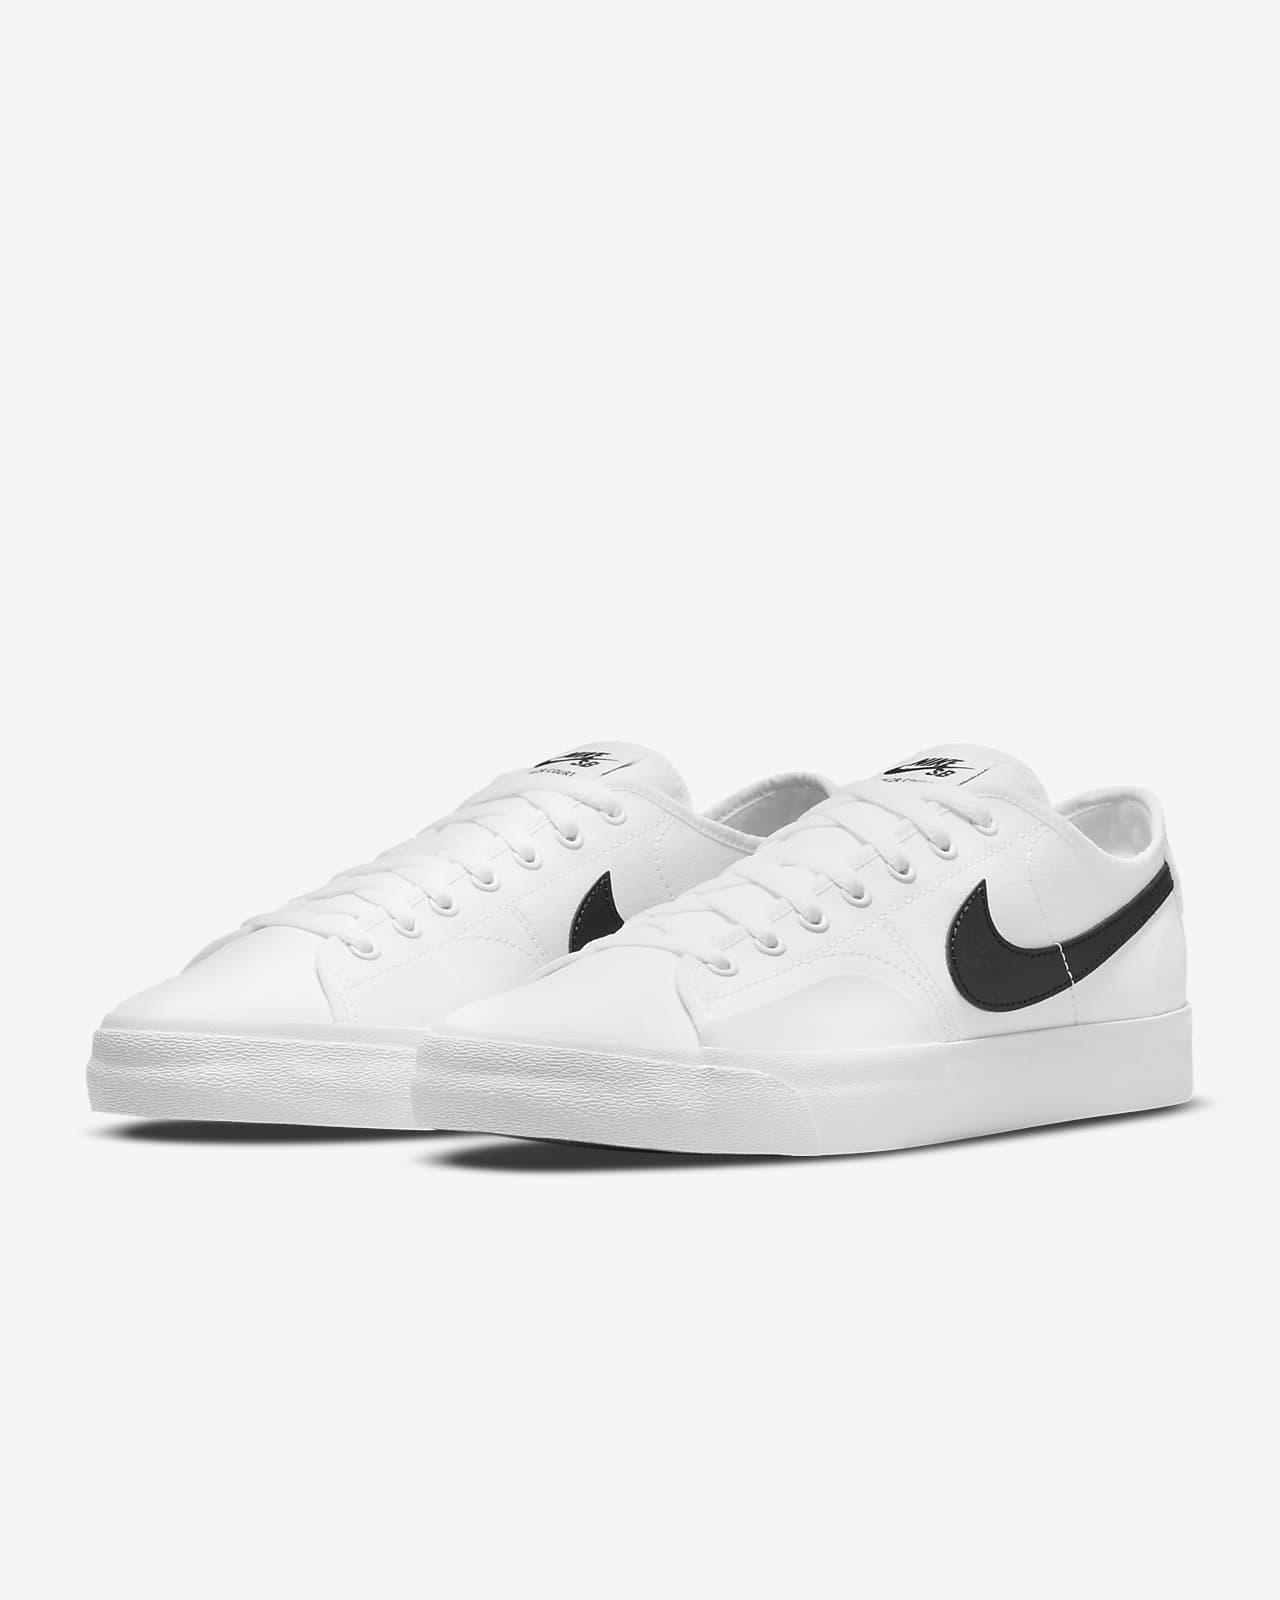 Nike SB BLZR Court Skate Shoes